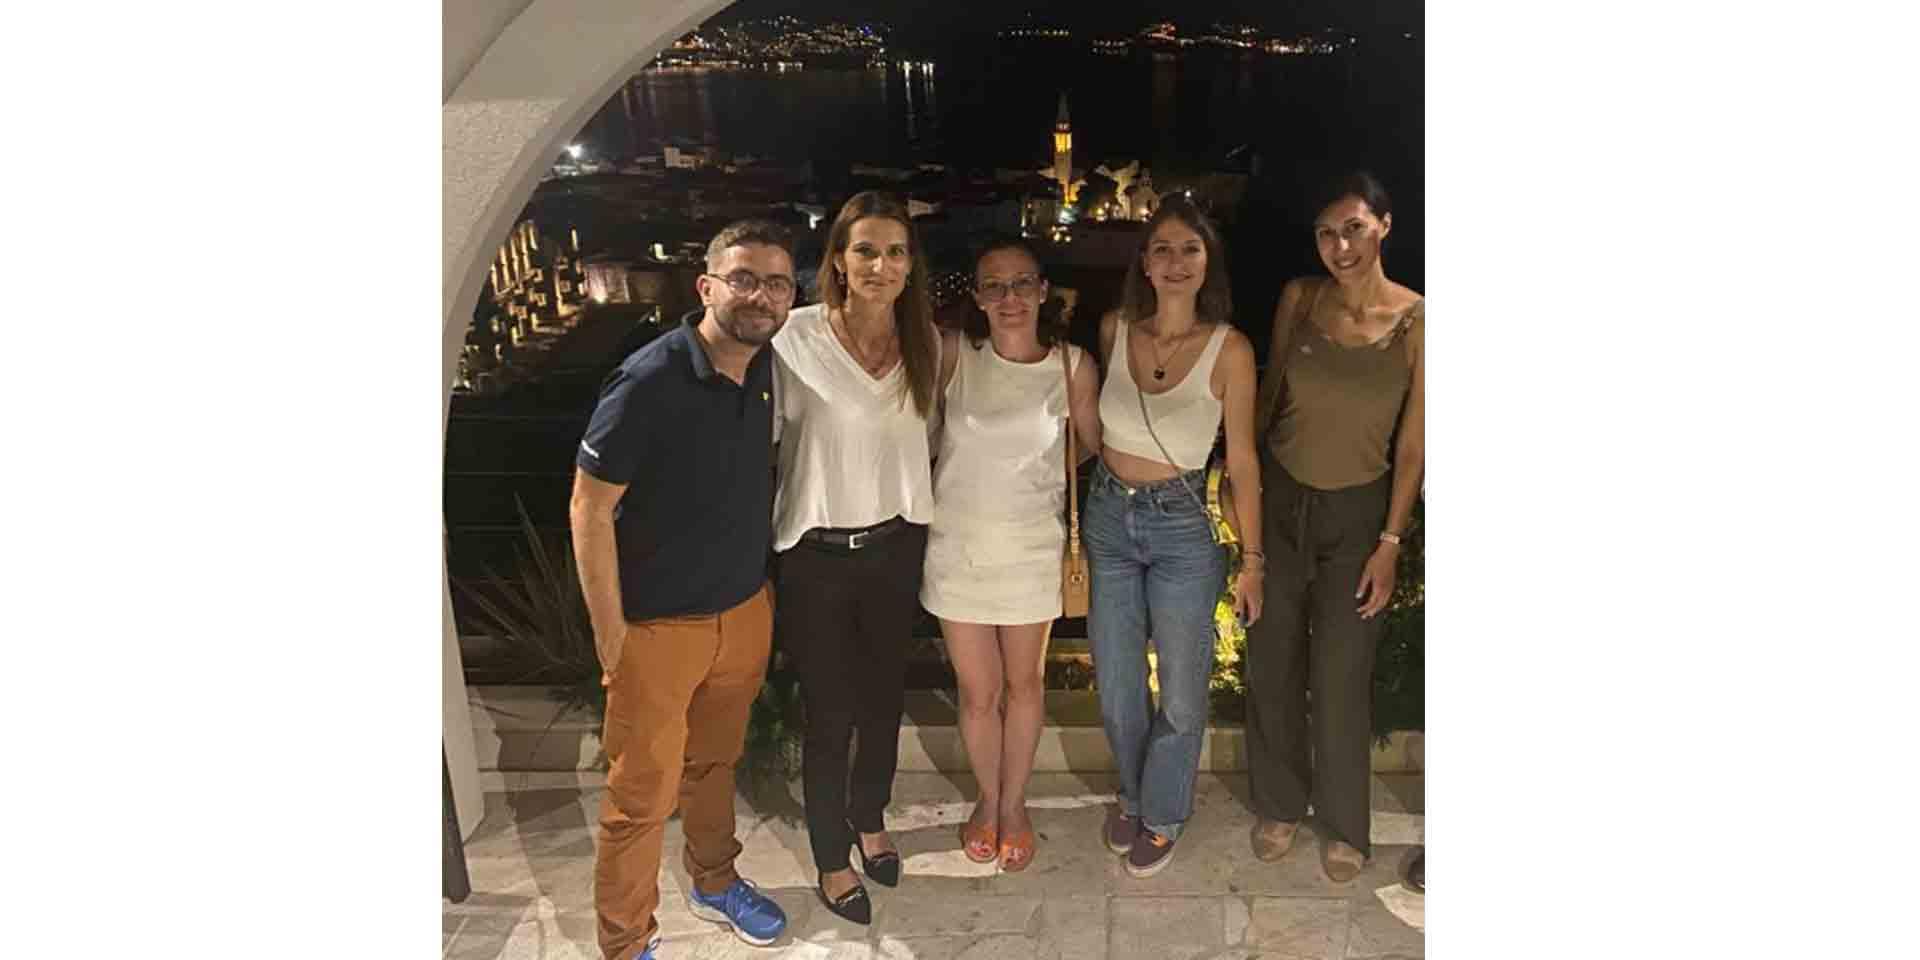 budva-Montenegro budva-nightlife budva-sea montenegro budva-activities